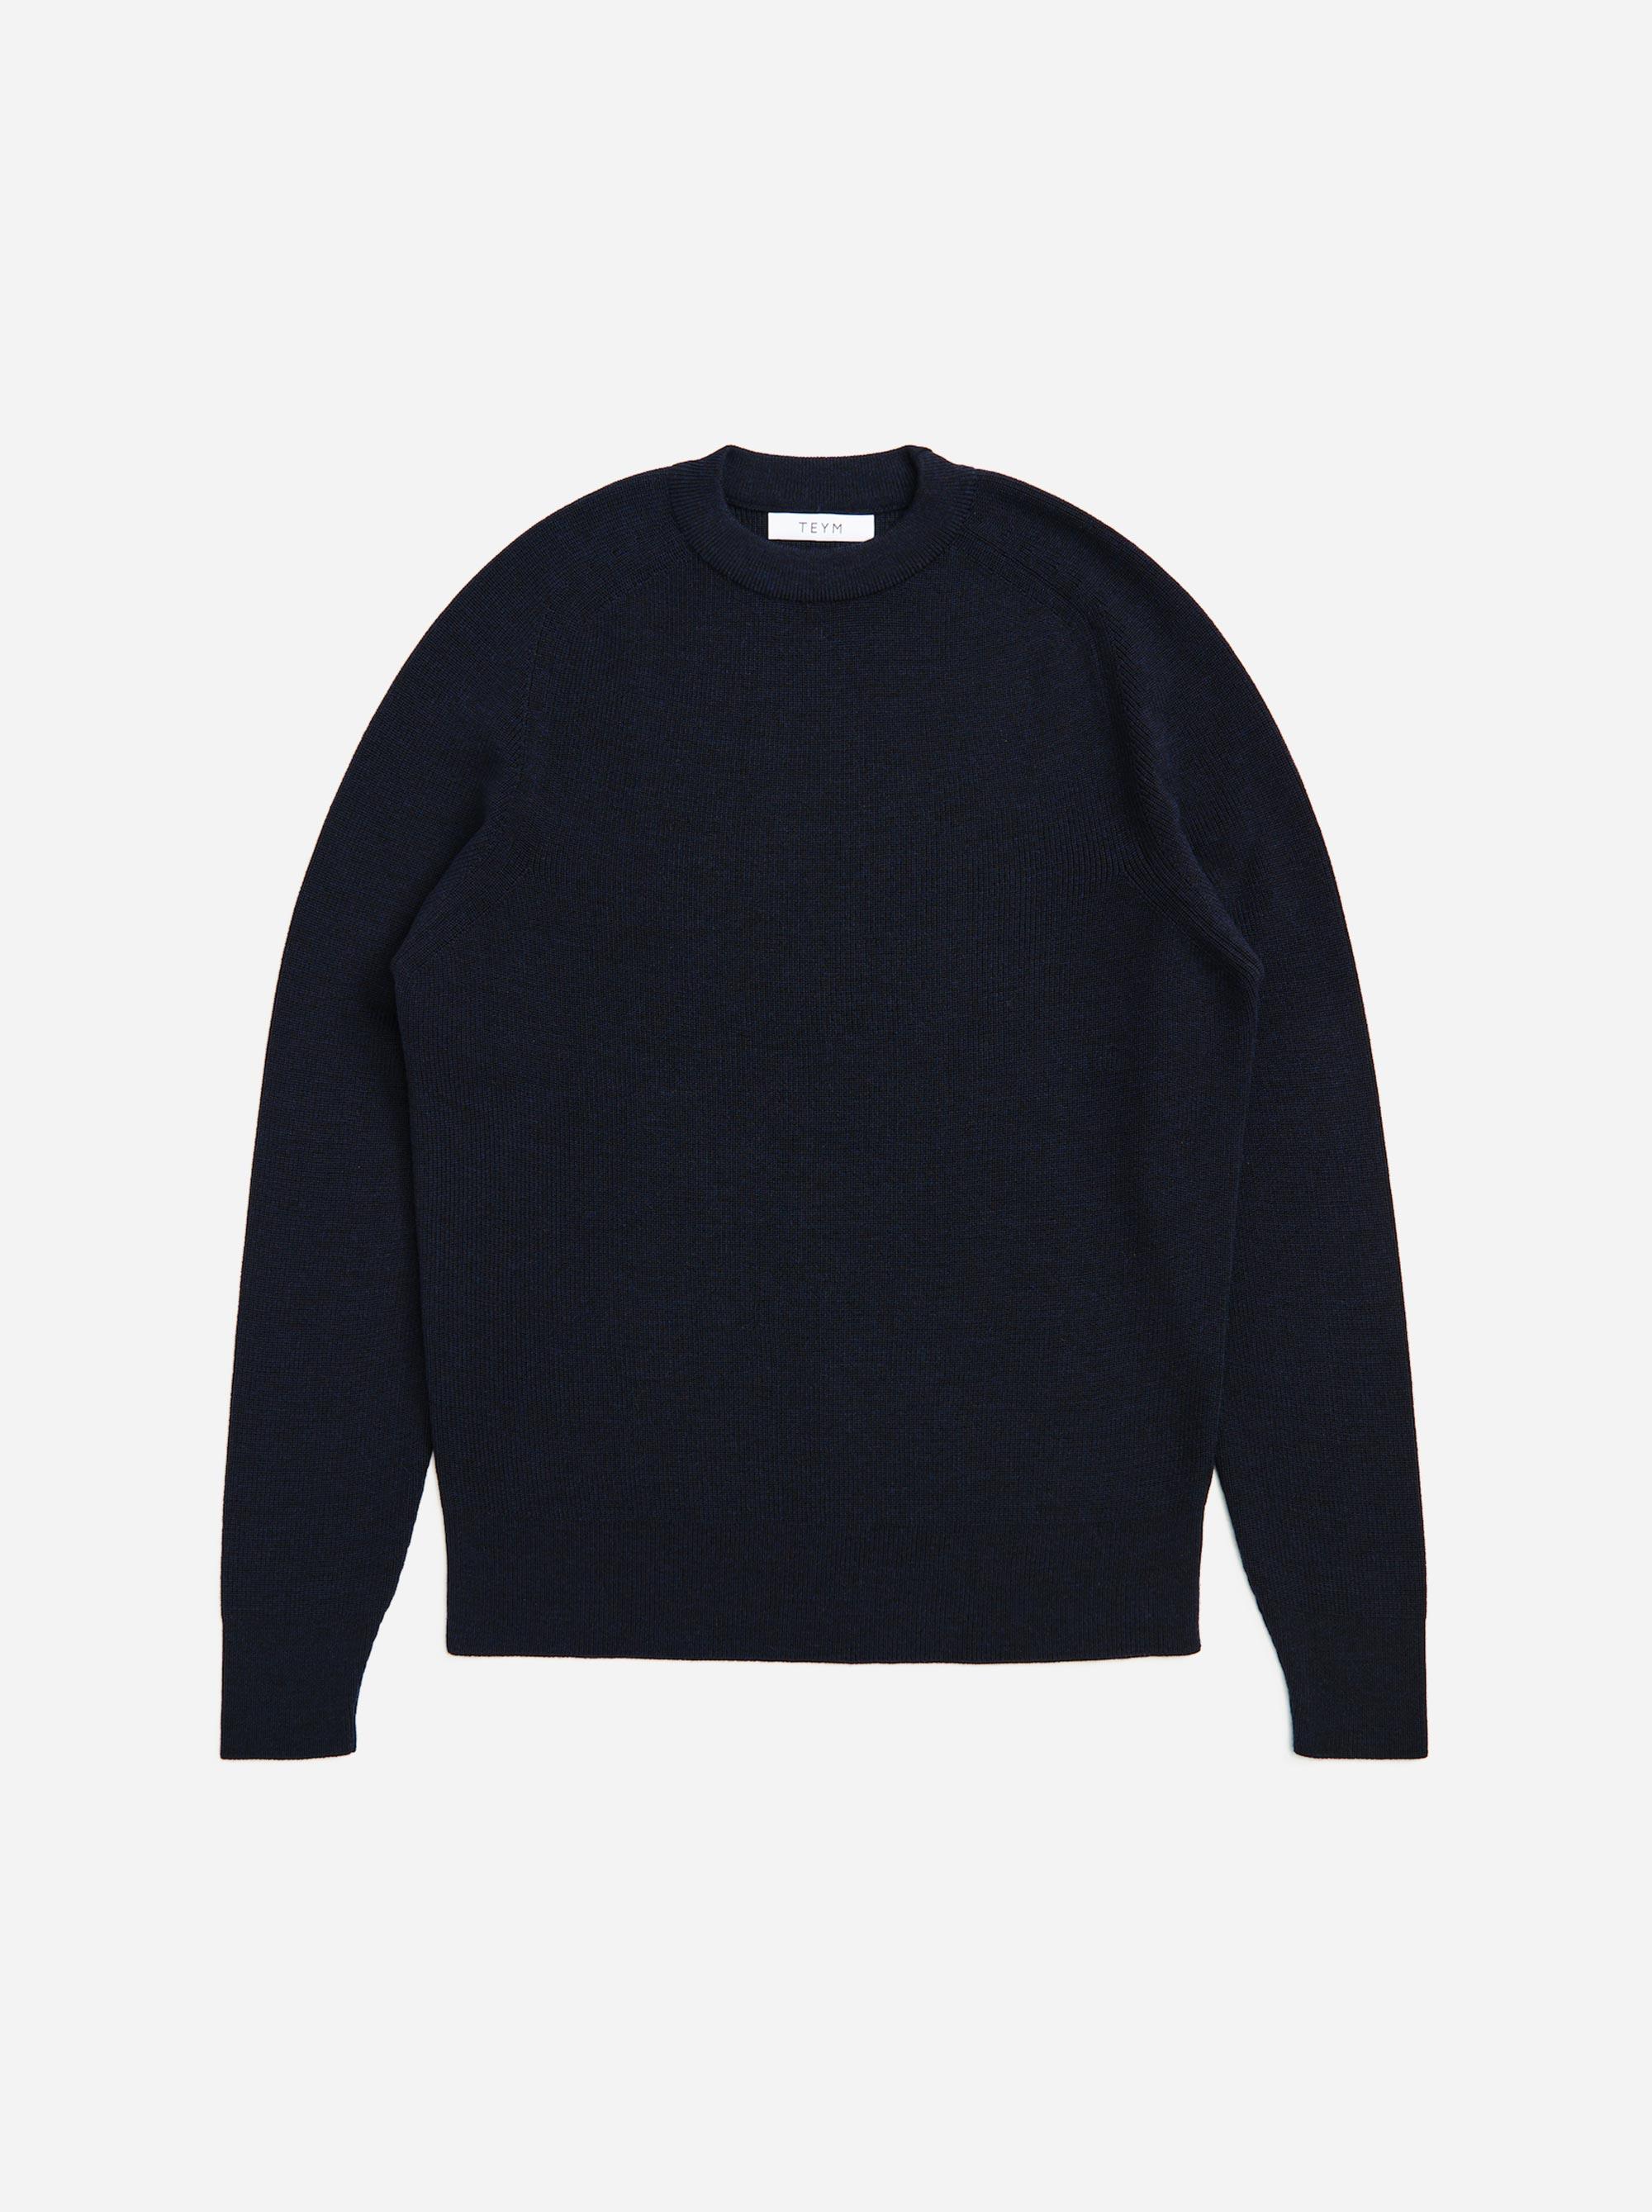 Teym - The Merino Sweater - Men - Blue - 5